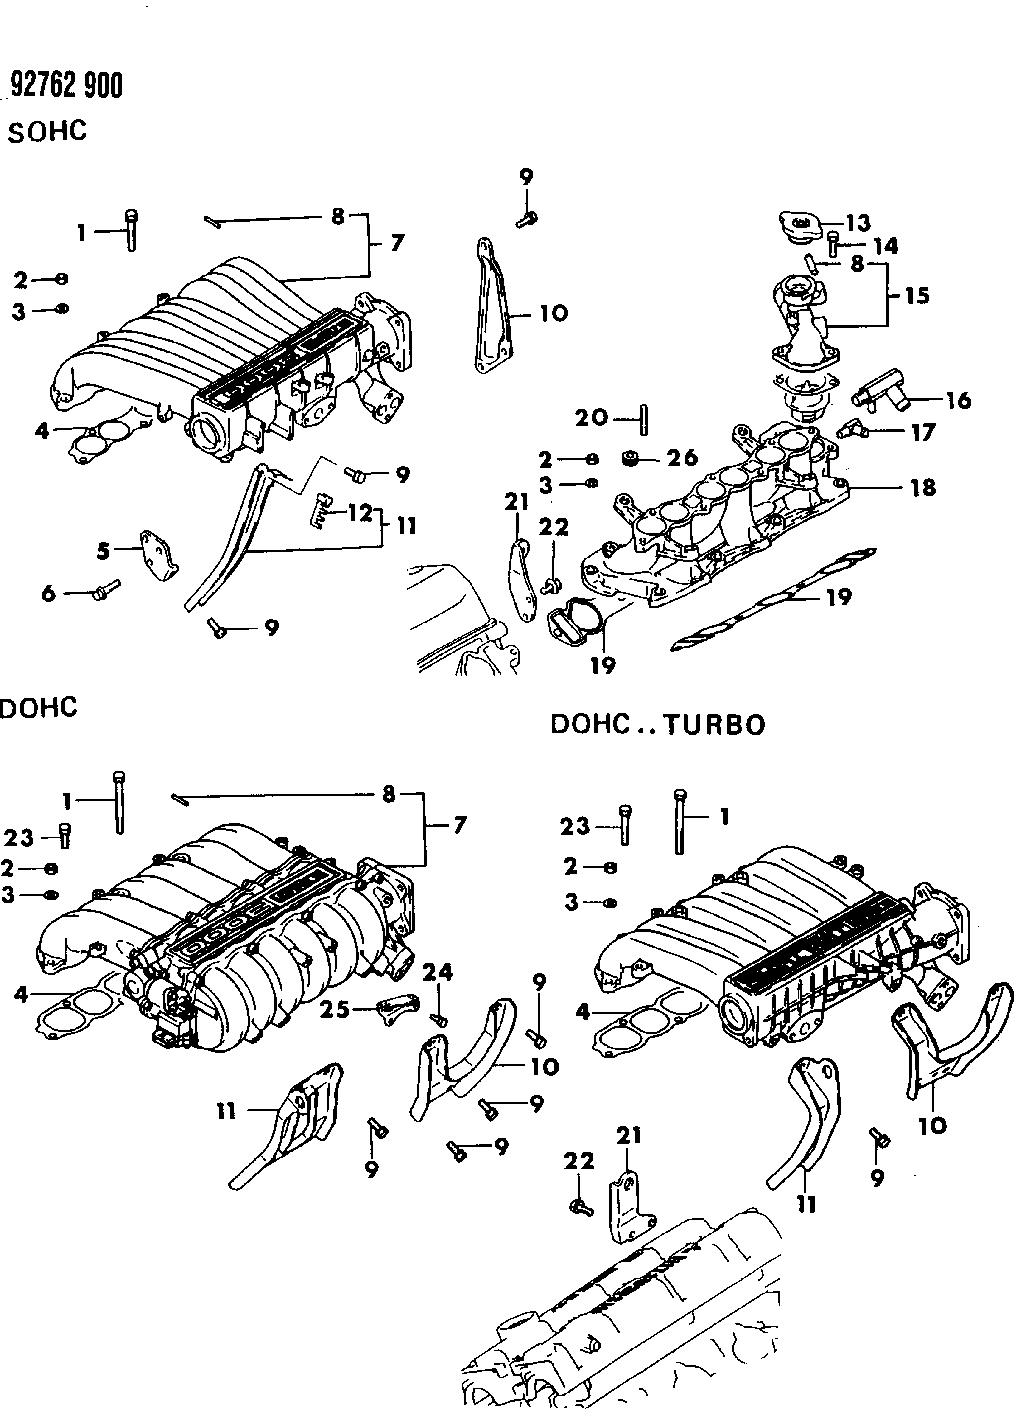 MC_9522] Dodge Stealth Engine Diagram Engine Car Parts And Component Diagram  Wiring DiagramDome Ilari Ivoro Bepta Mohammedshrine Librar Wiring 101